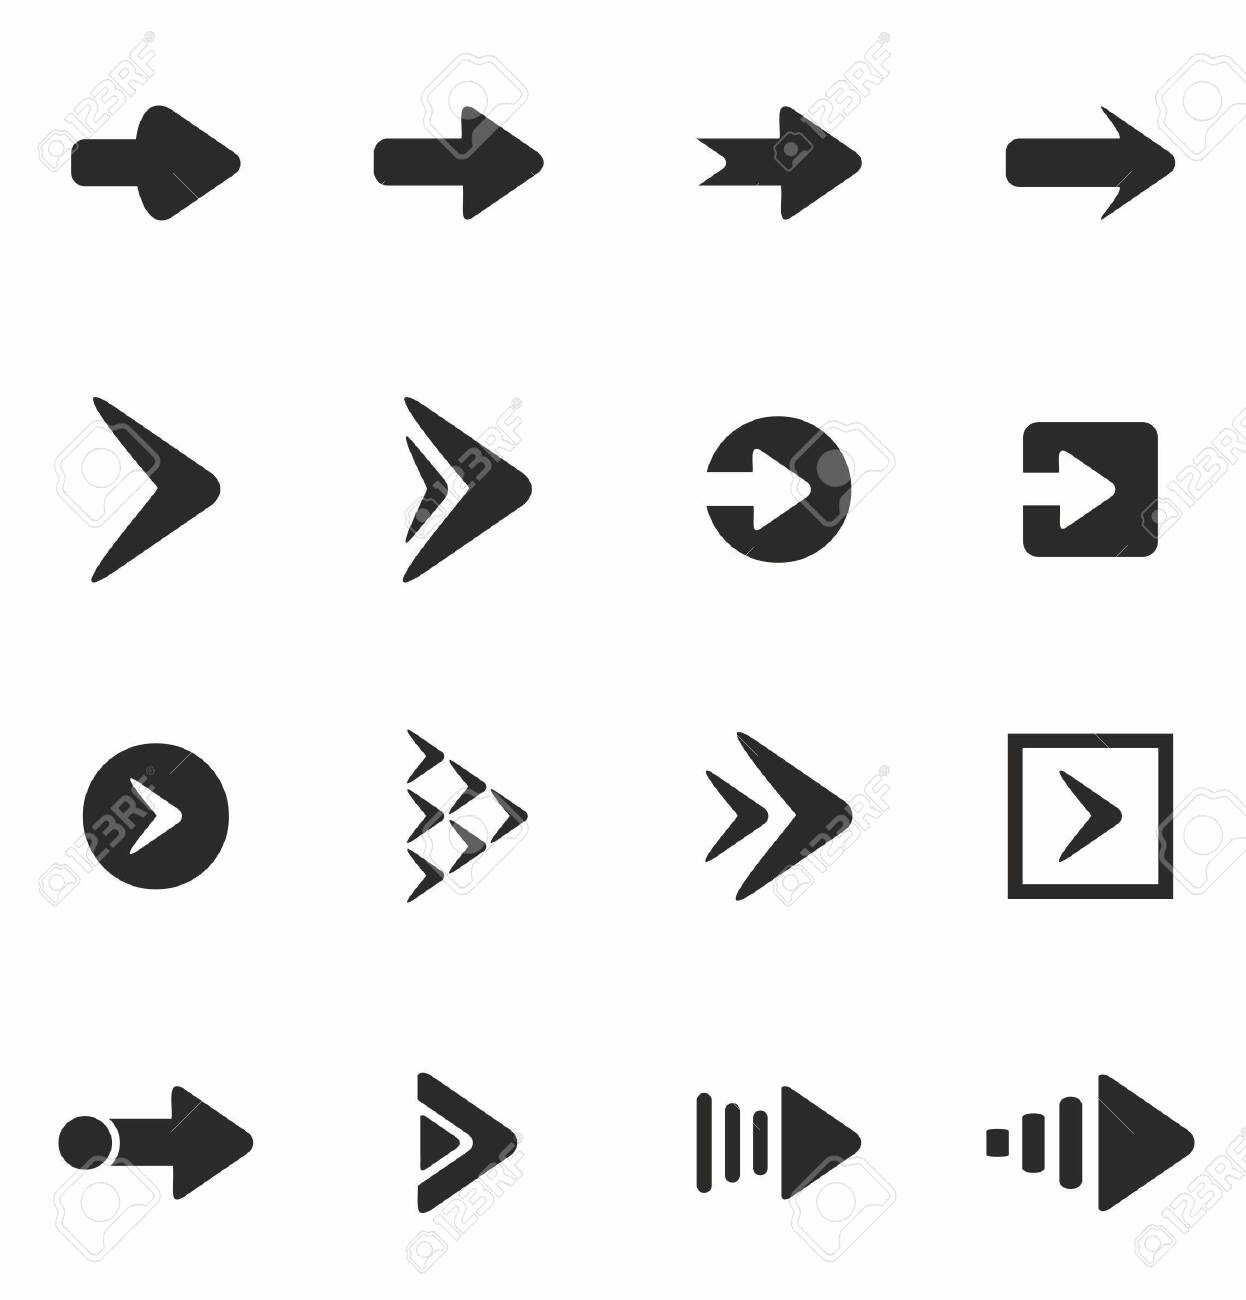 Arrow icon set isolated on white background vector illustration - 153478106